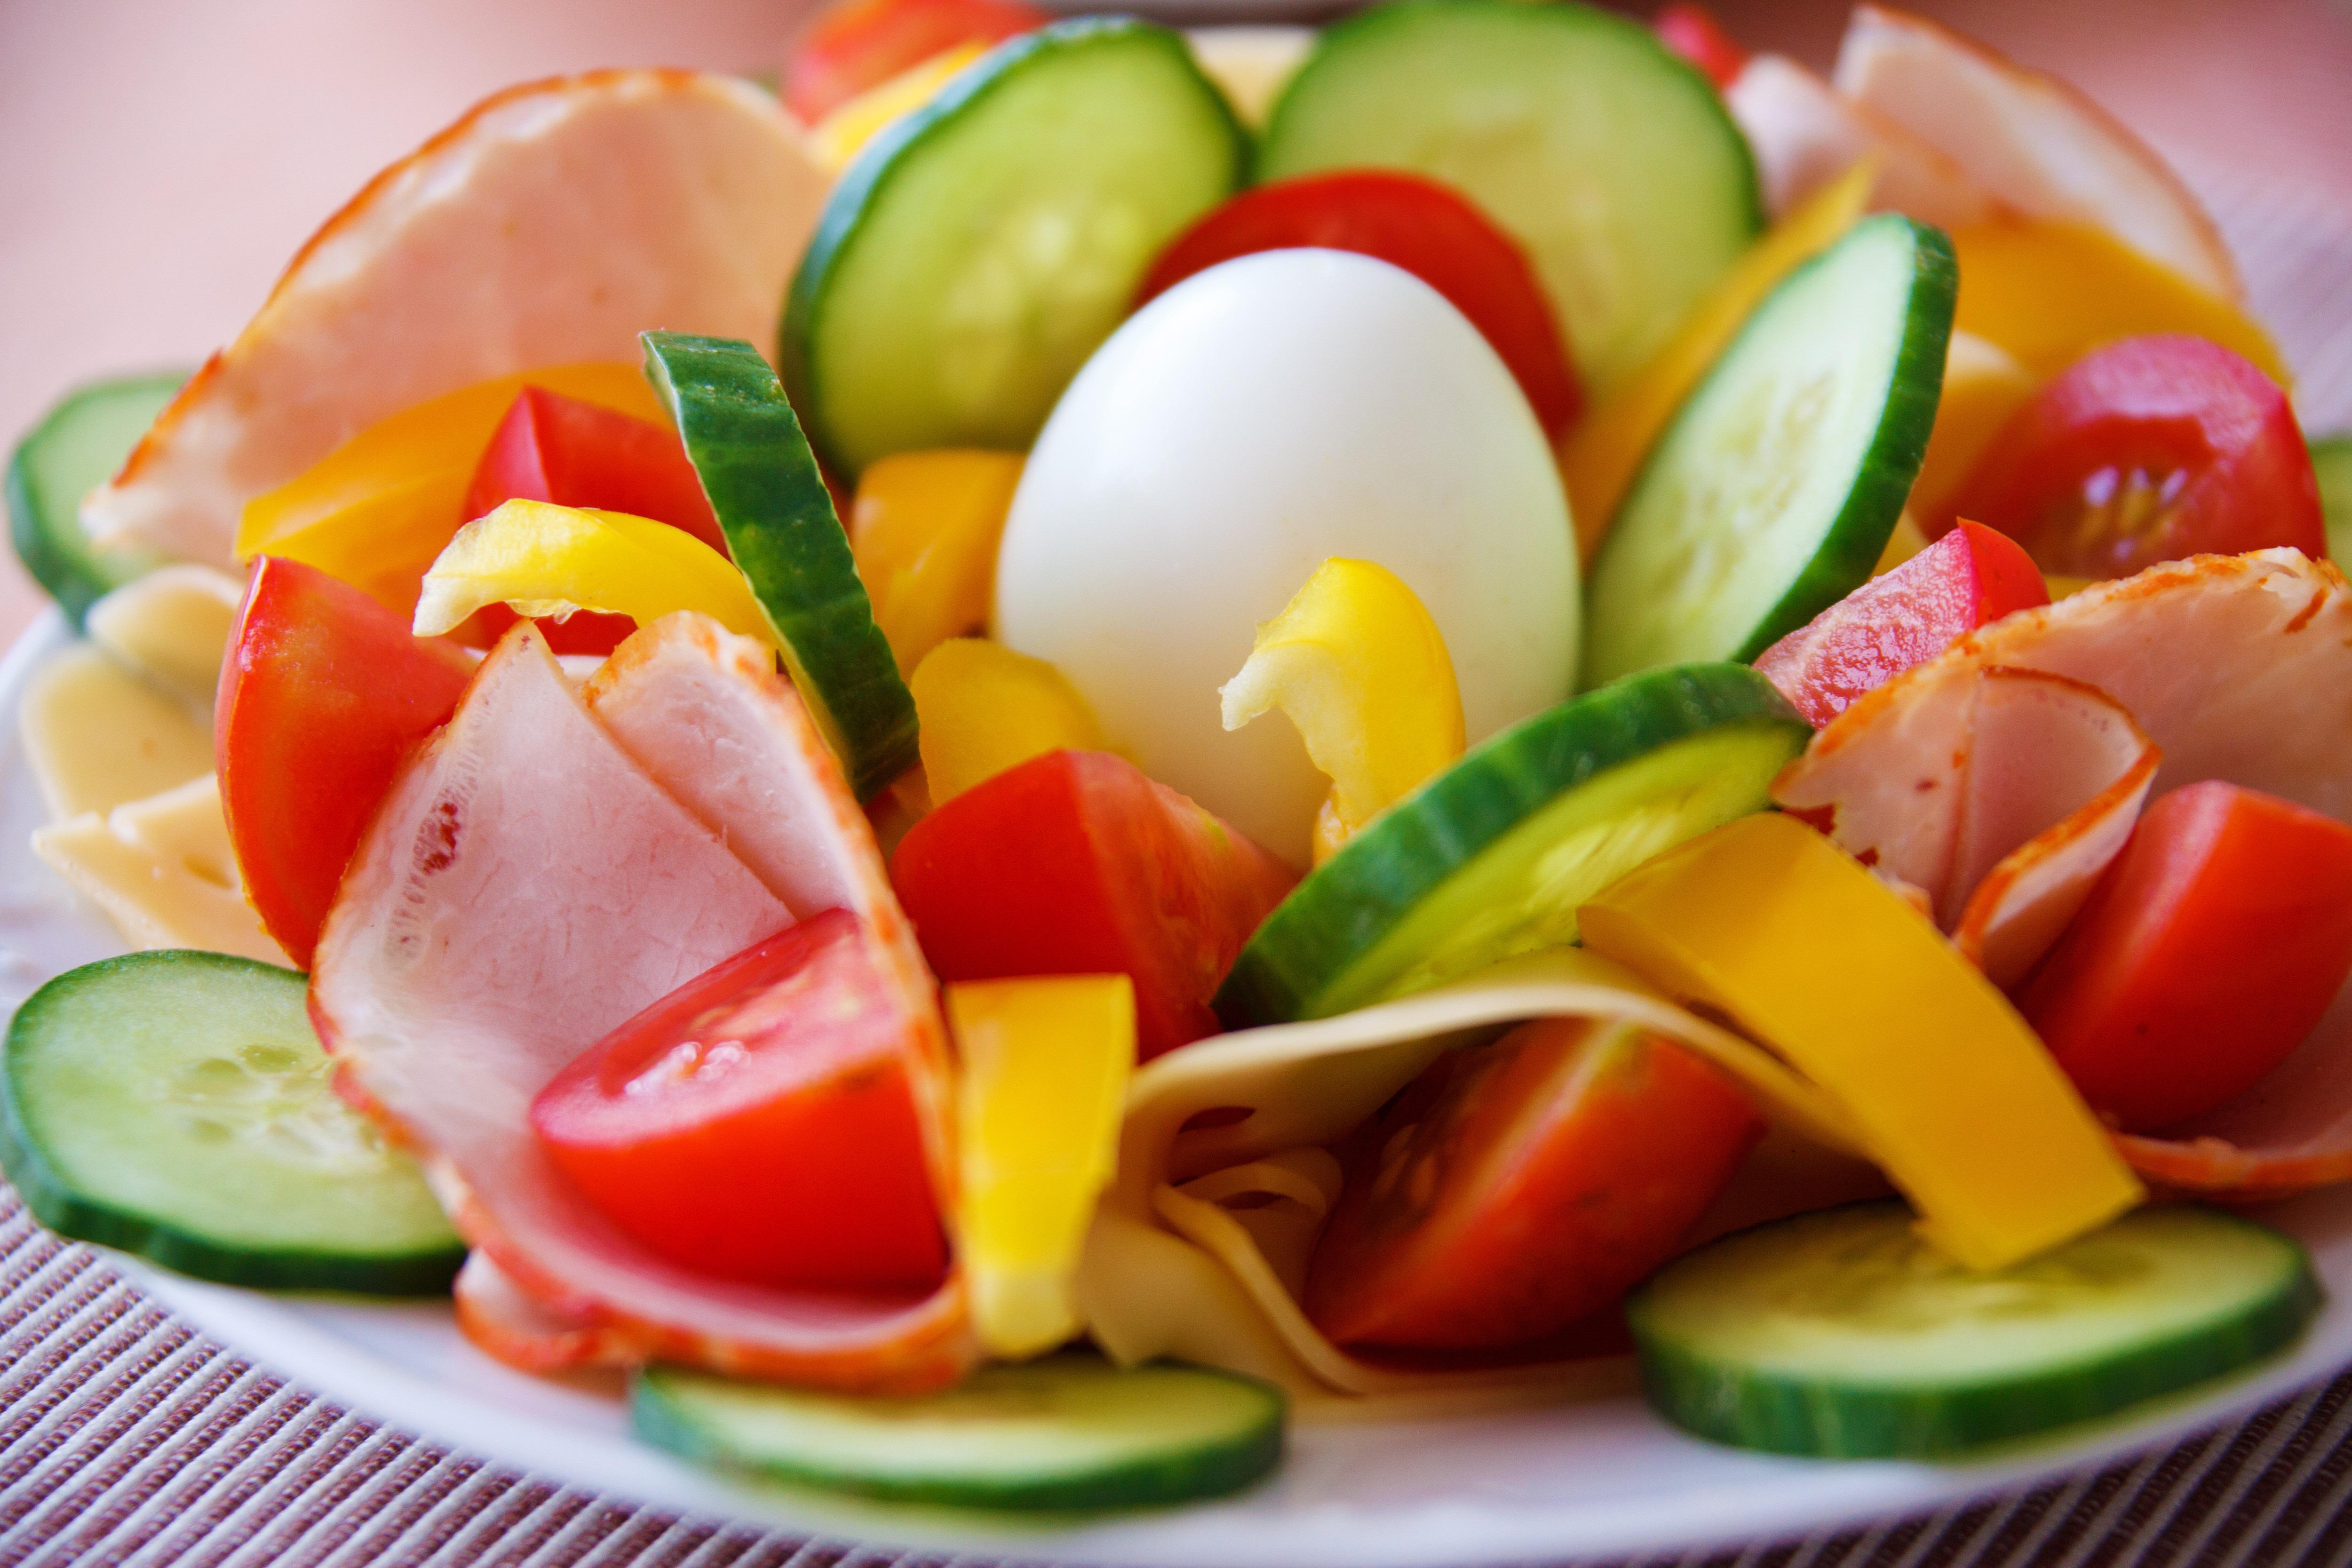 Sliced vegetable photo